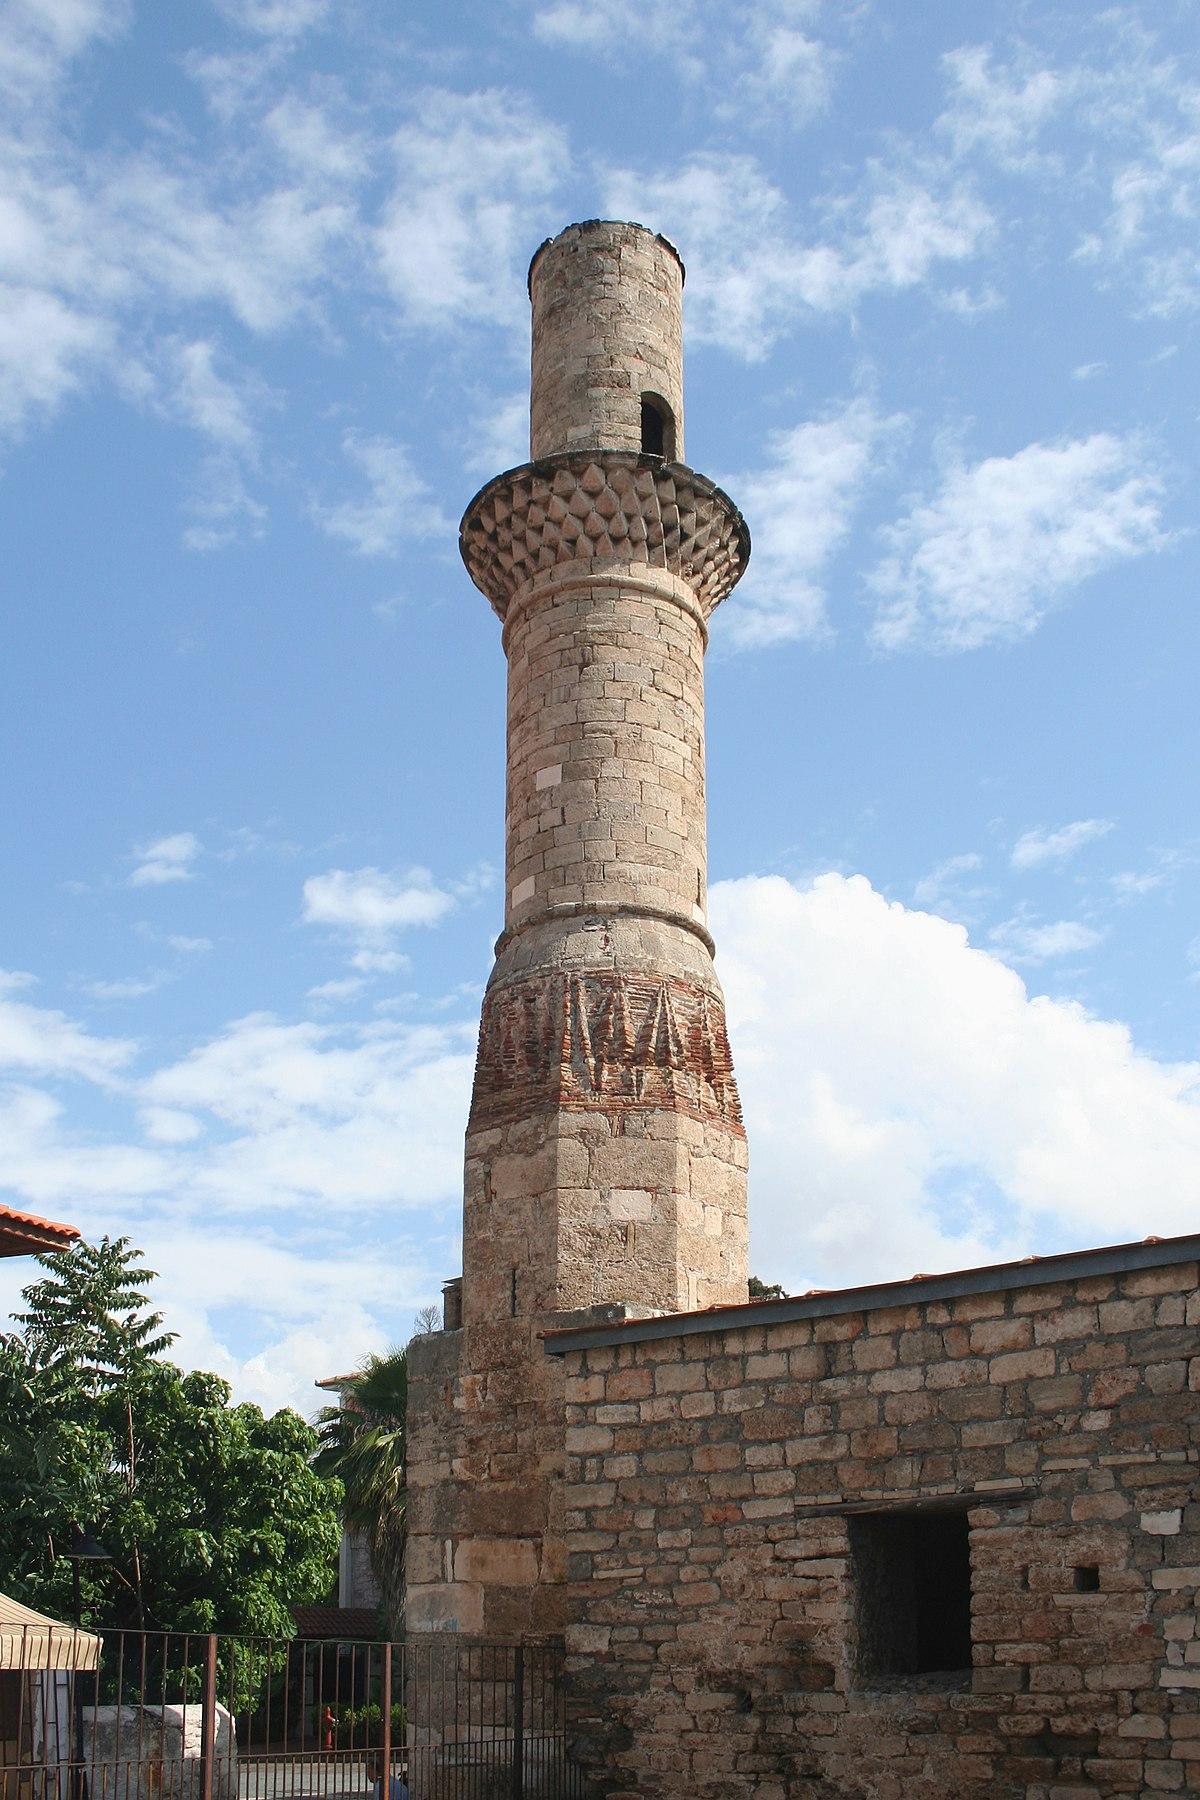 Kesik Minare Wikipedia